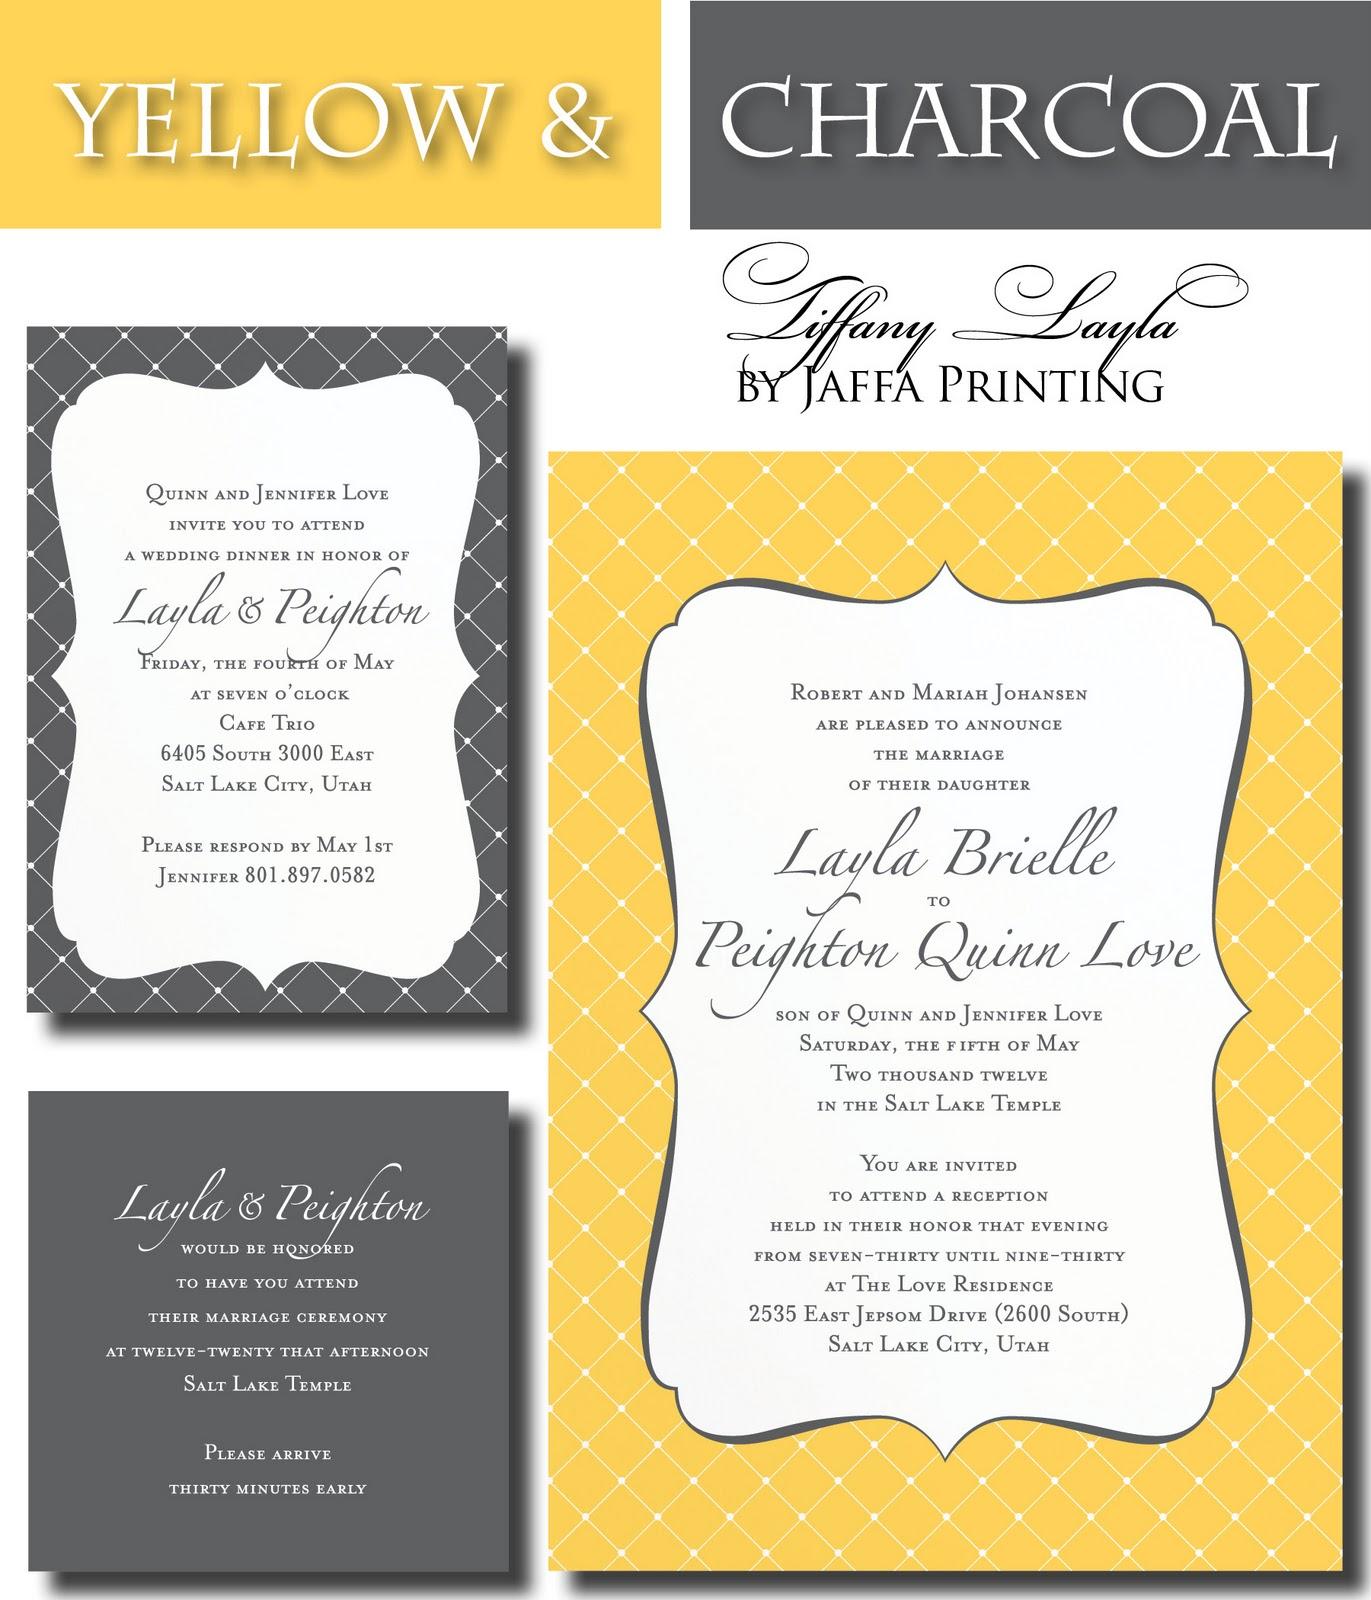 Wedding Invitation Blog: 2011 Color Trend in Wedding Invitations